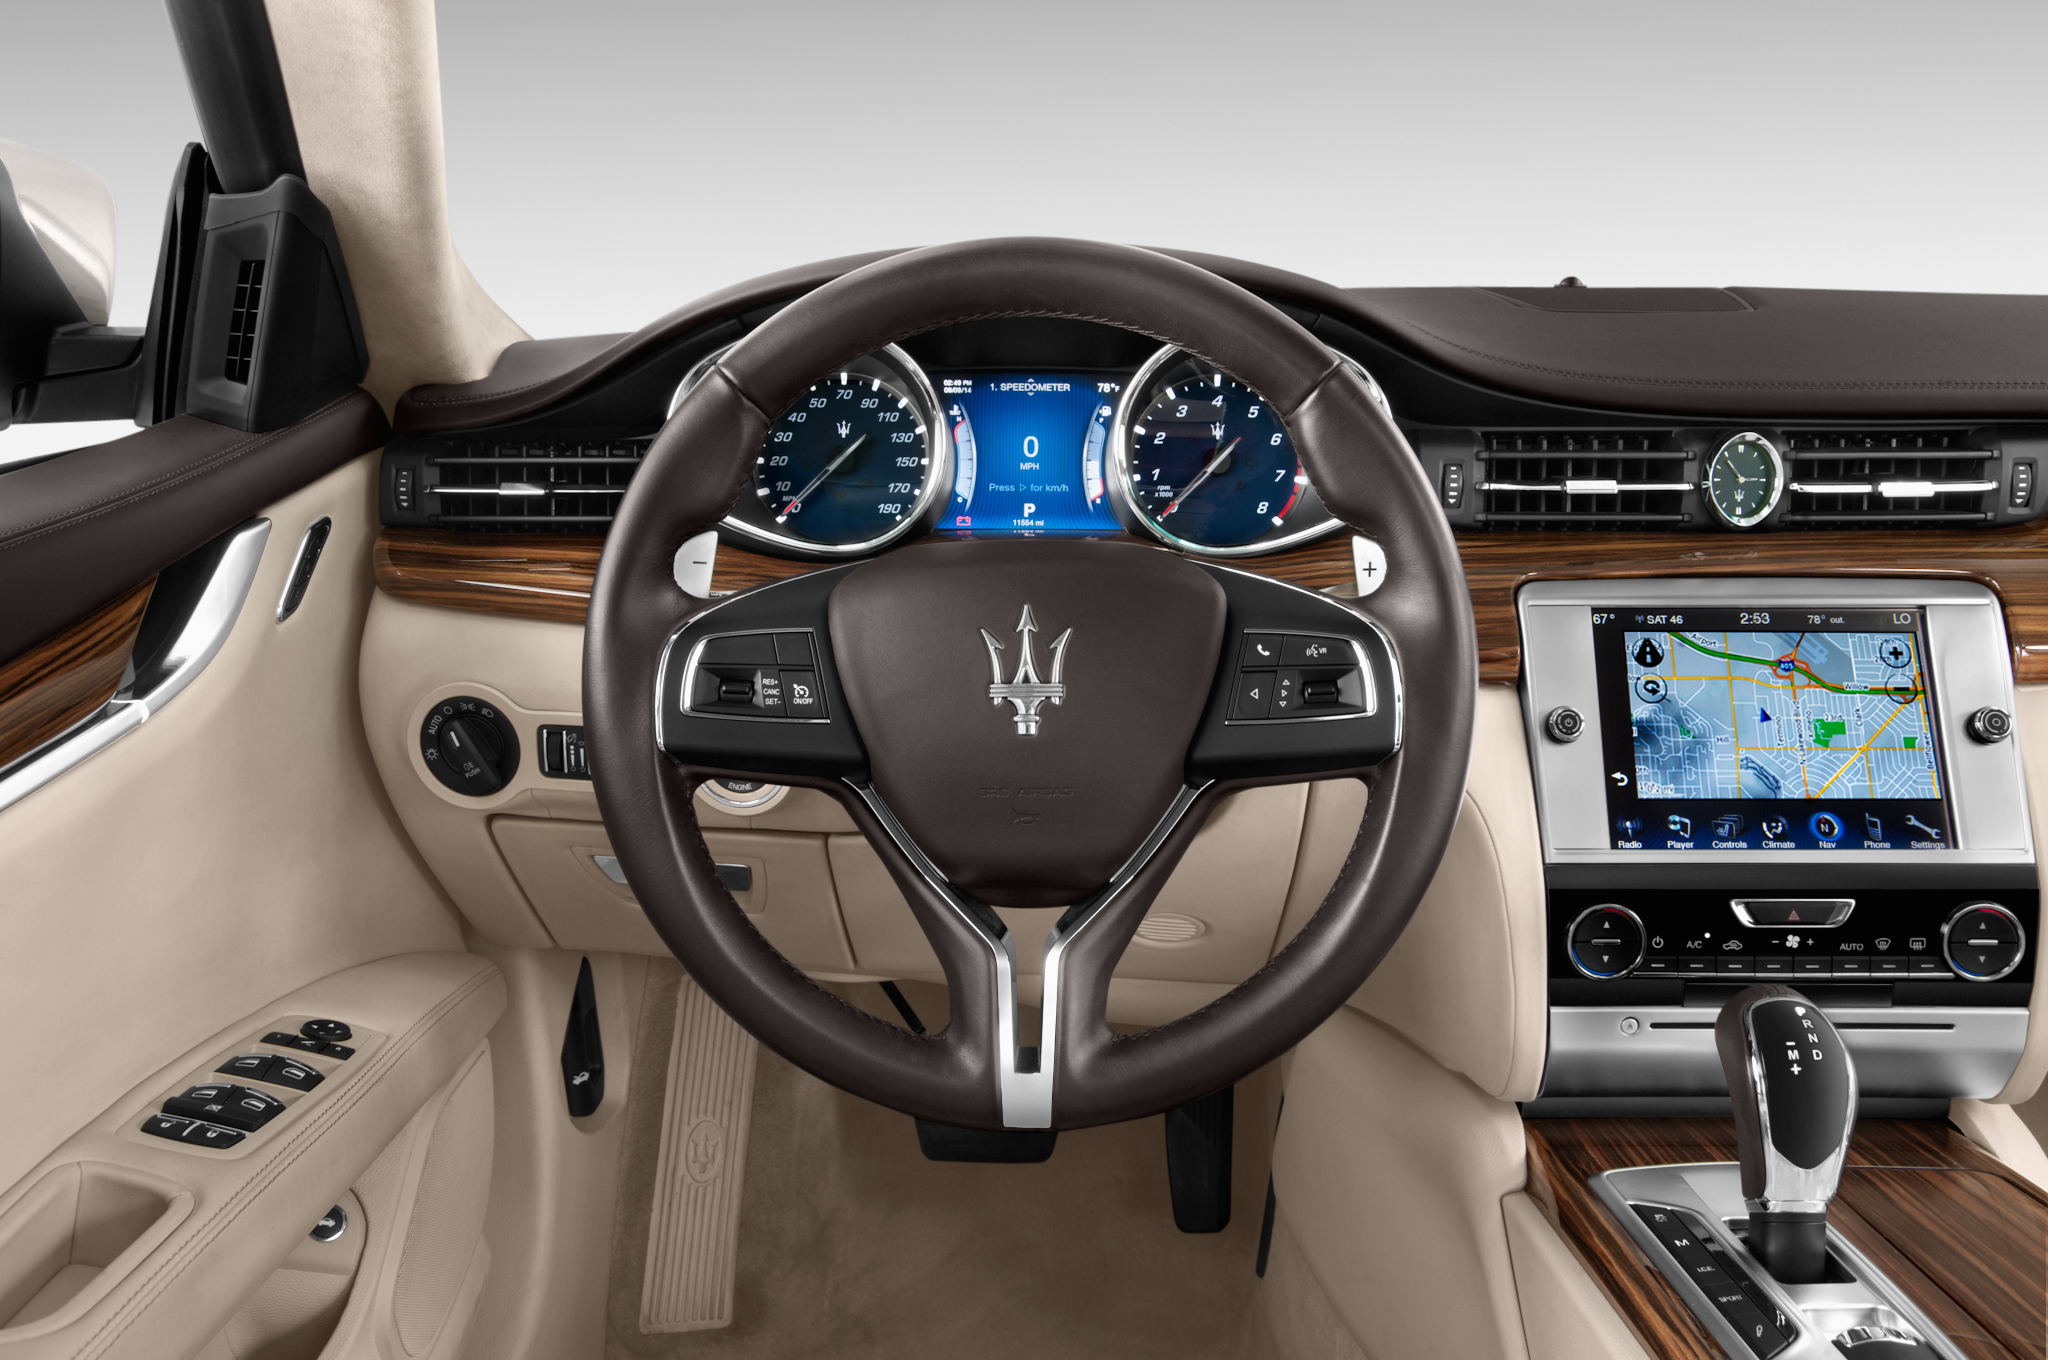 2018 maserati 4 door. Perfect 2018 1725 Intended 2018 Maserati 4 Door S